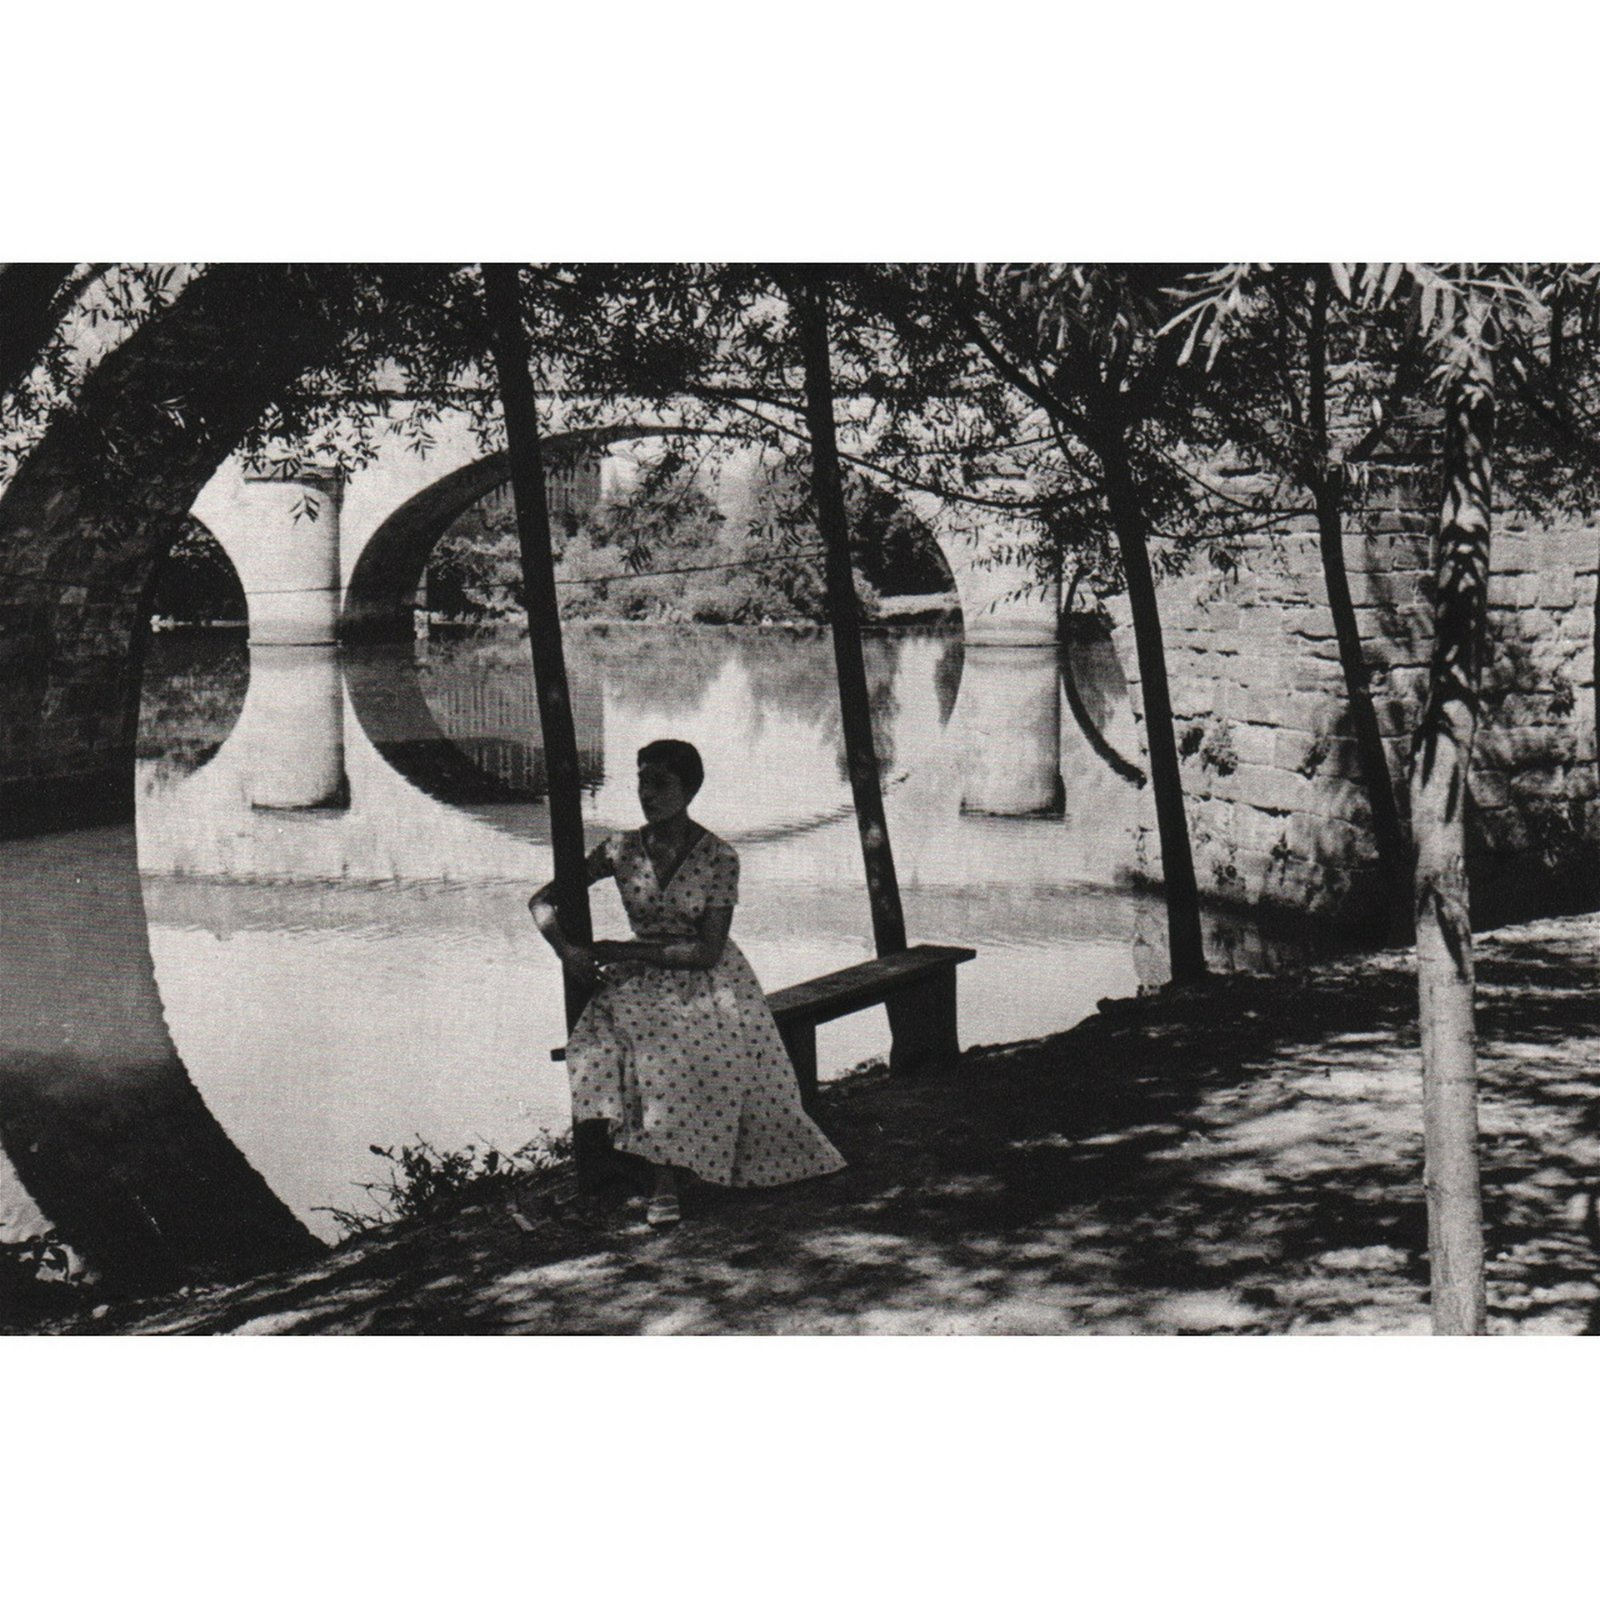 EDOUARD BOUBAT - Espaglion, 1953